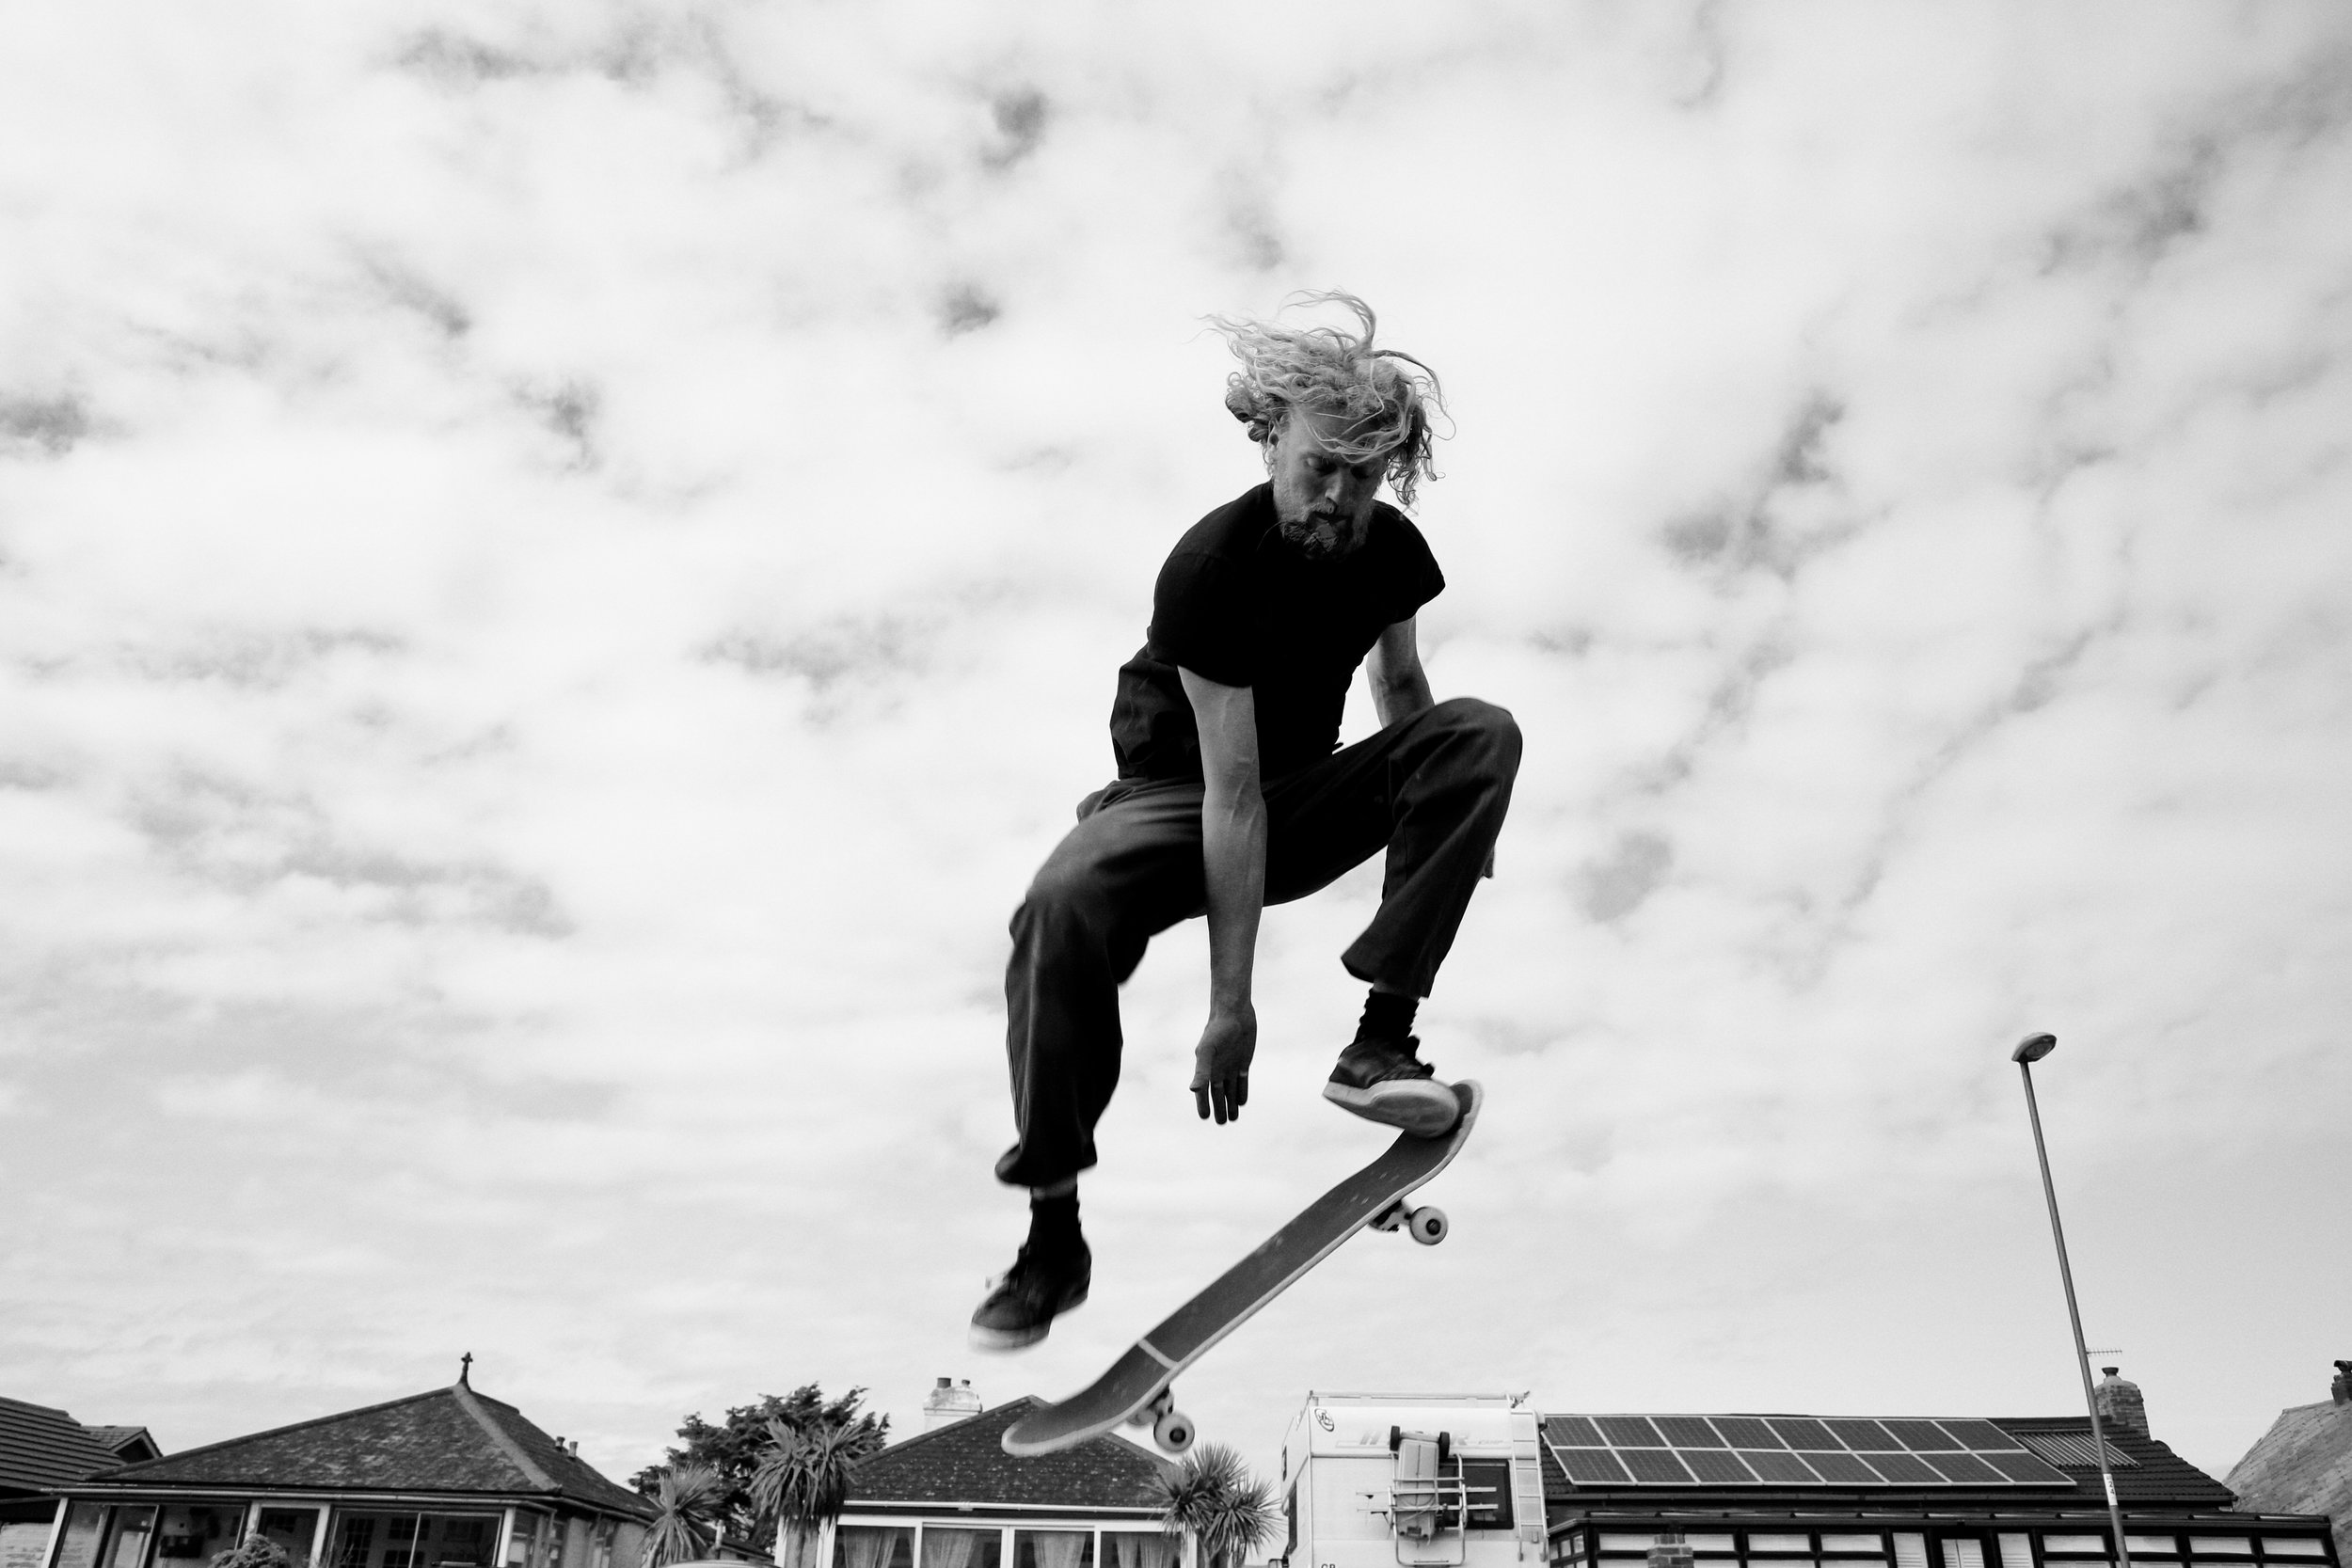 Samana, Samana music, Franklin Mockett, Skating, skateboarding